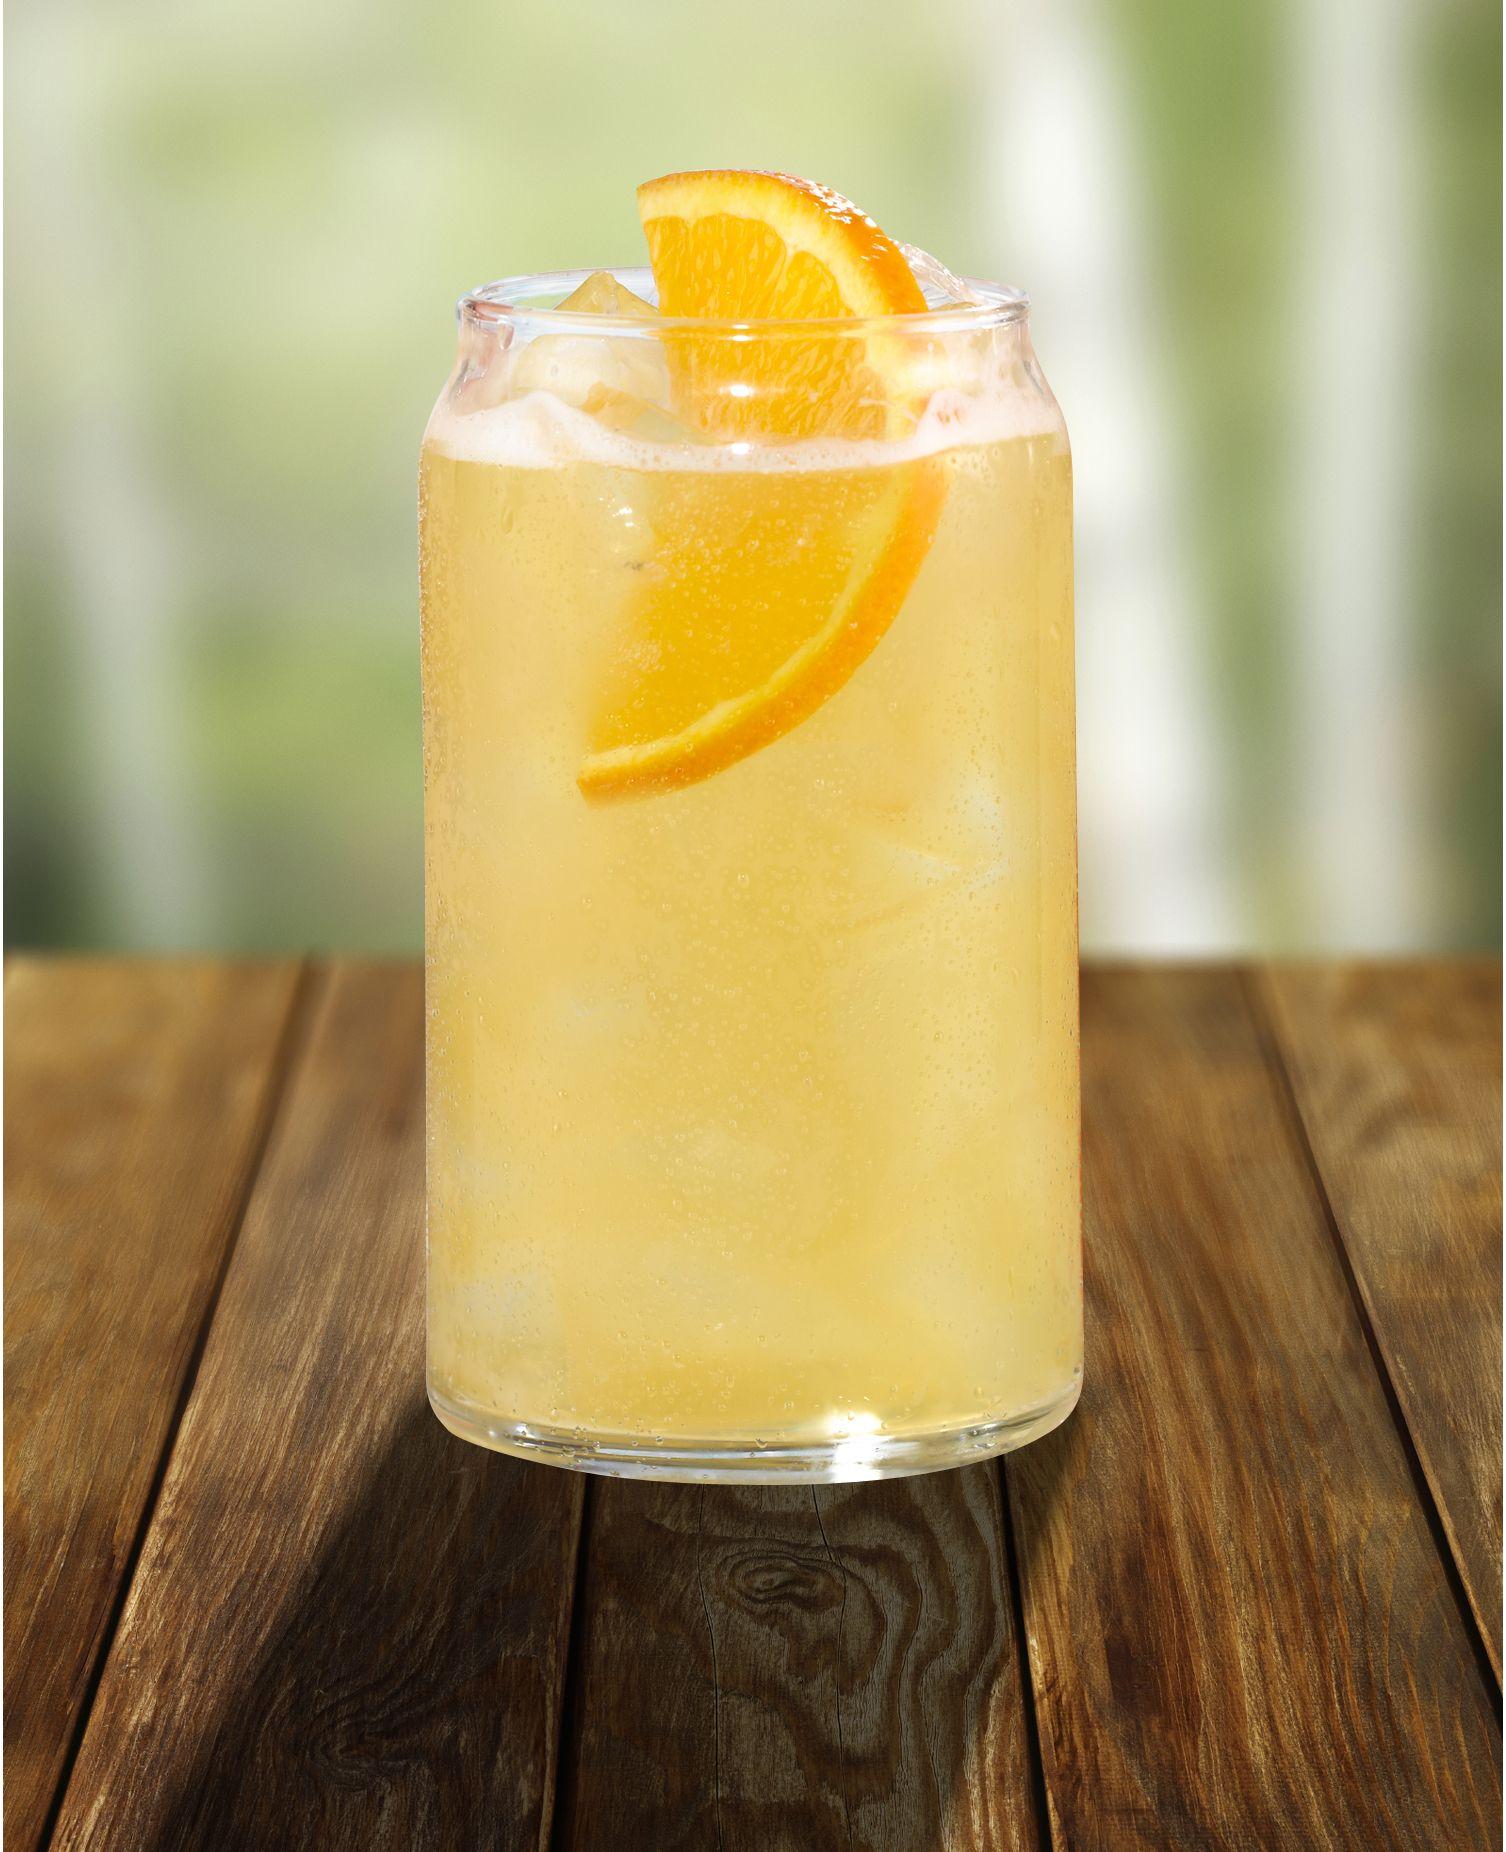 Shock Top Margarita! Tastes even better than it looks